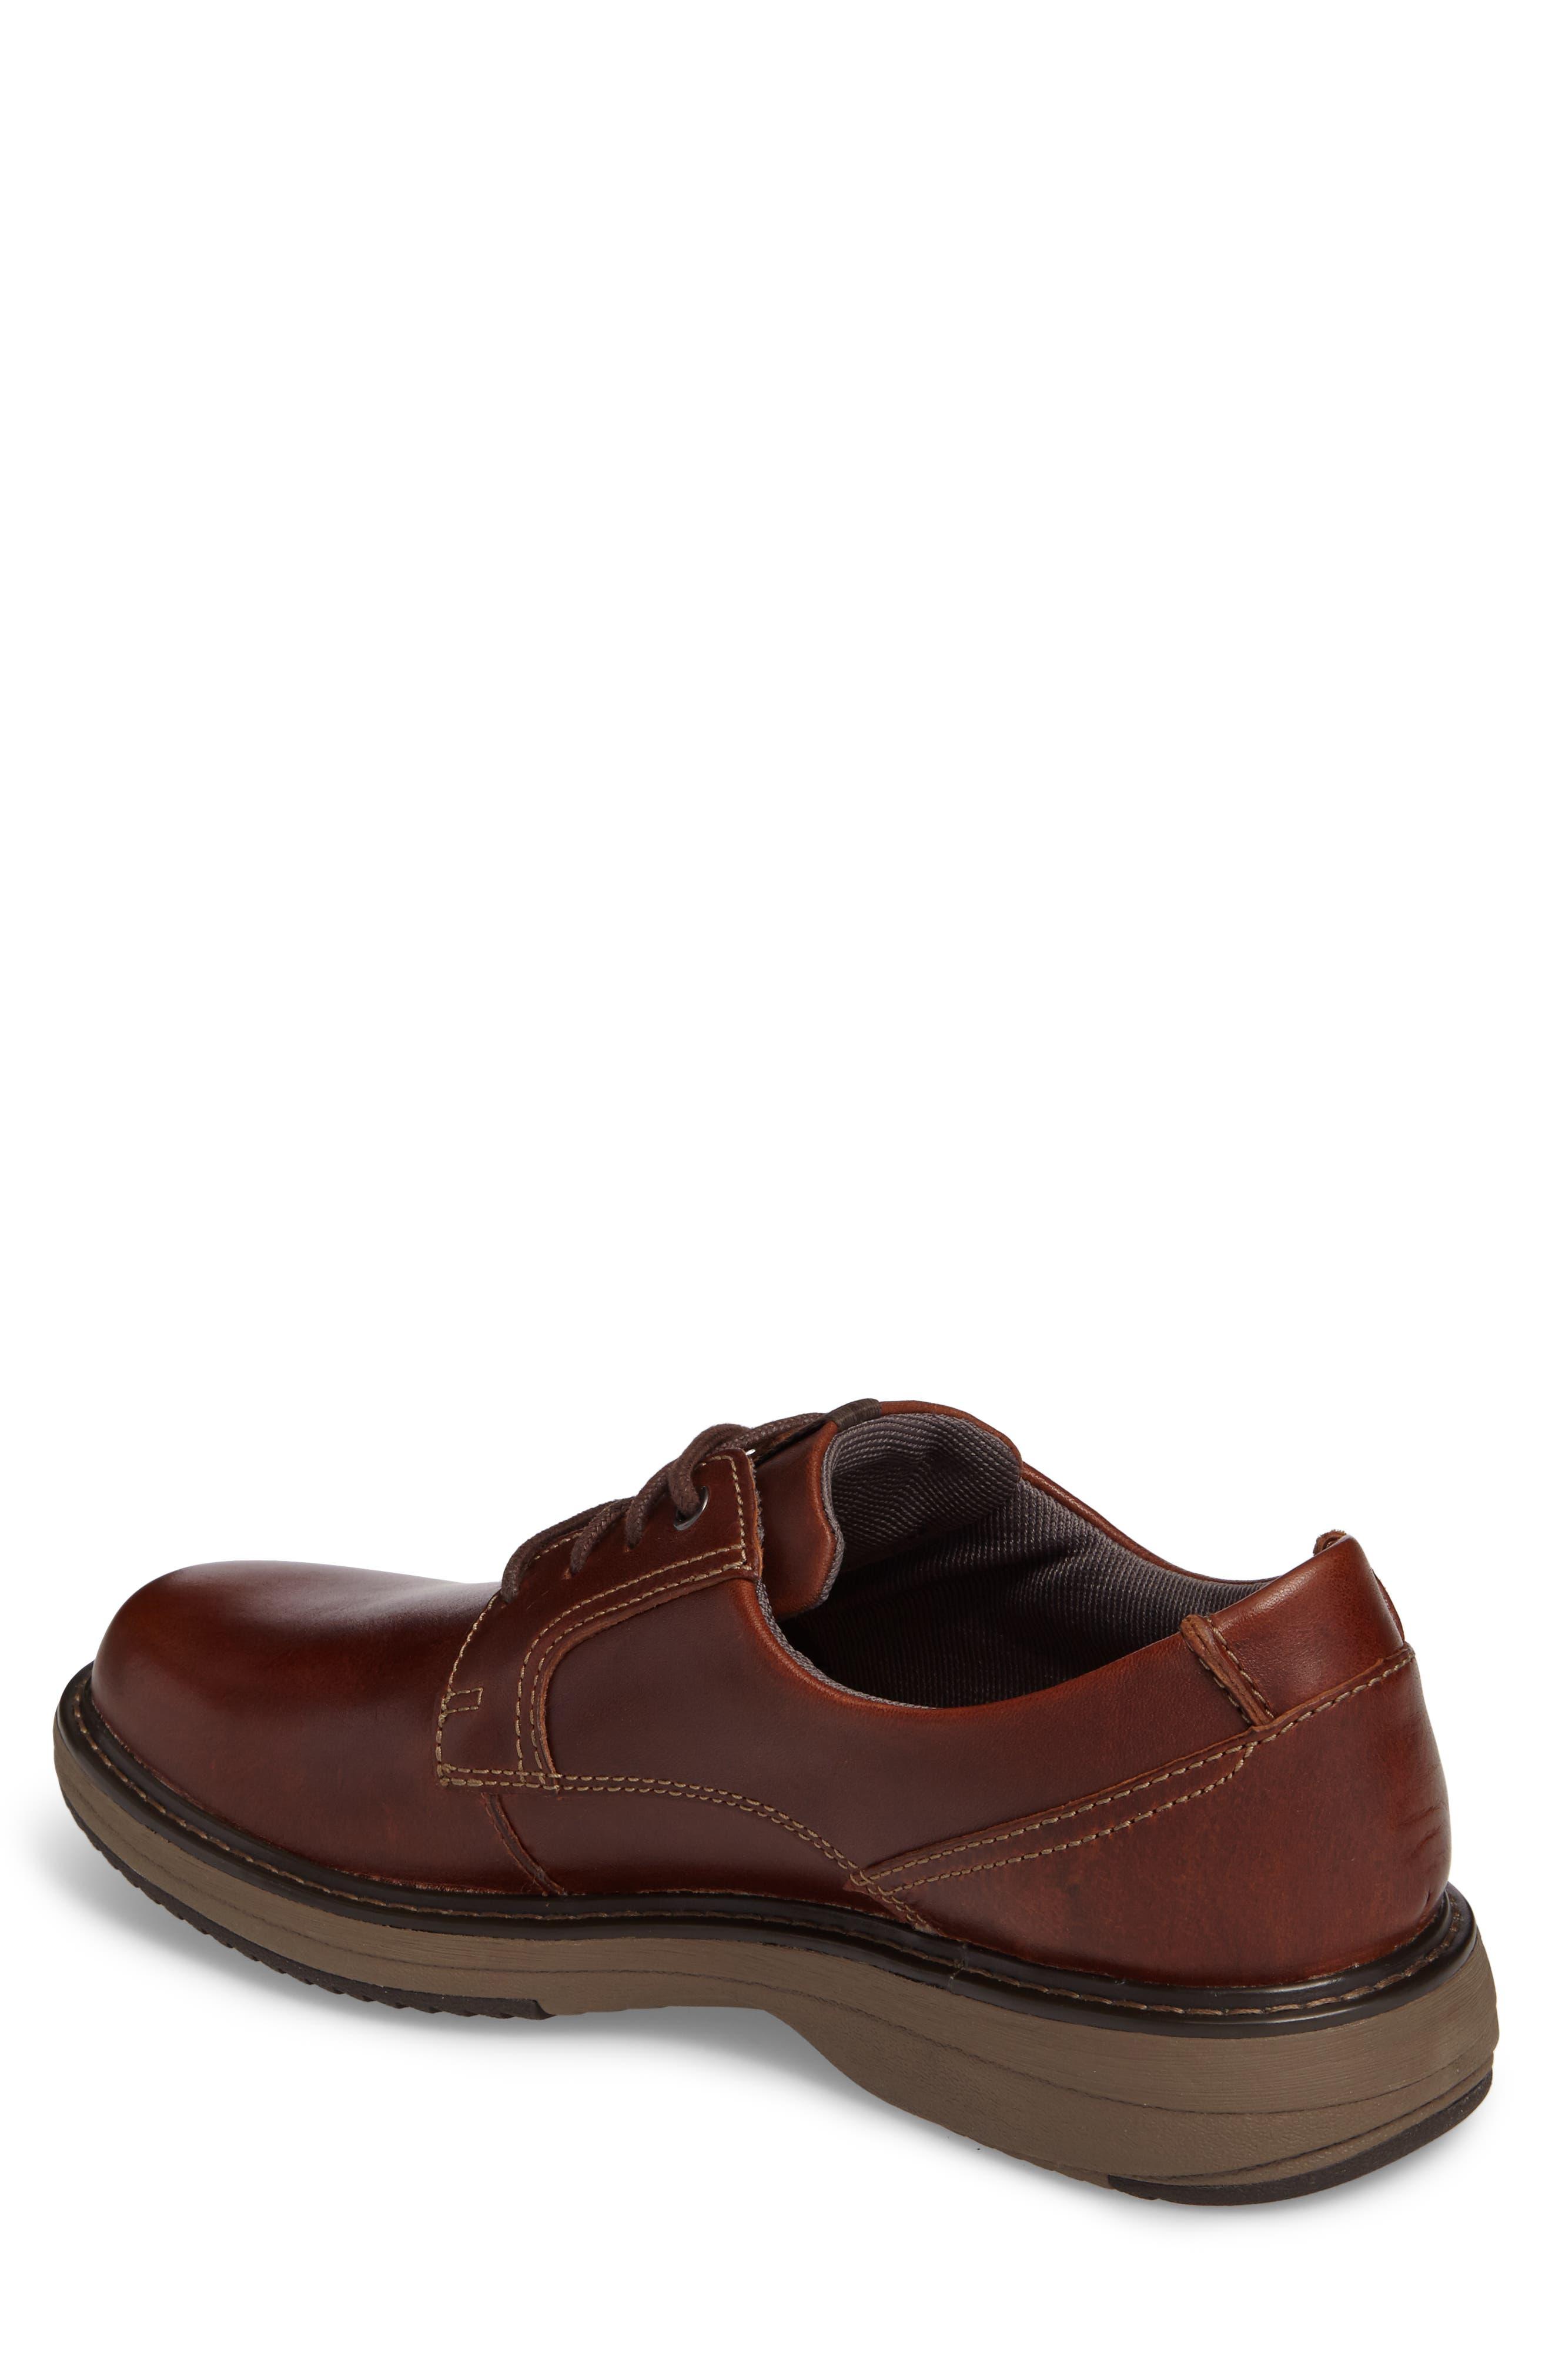 Cushox Plain Toe Derby,                             Alternate thumbnail 2, color,                             Dark Tan Leather